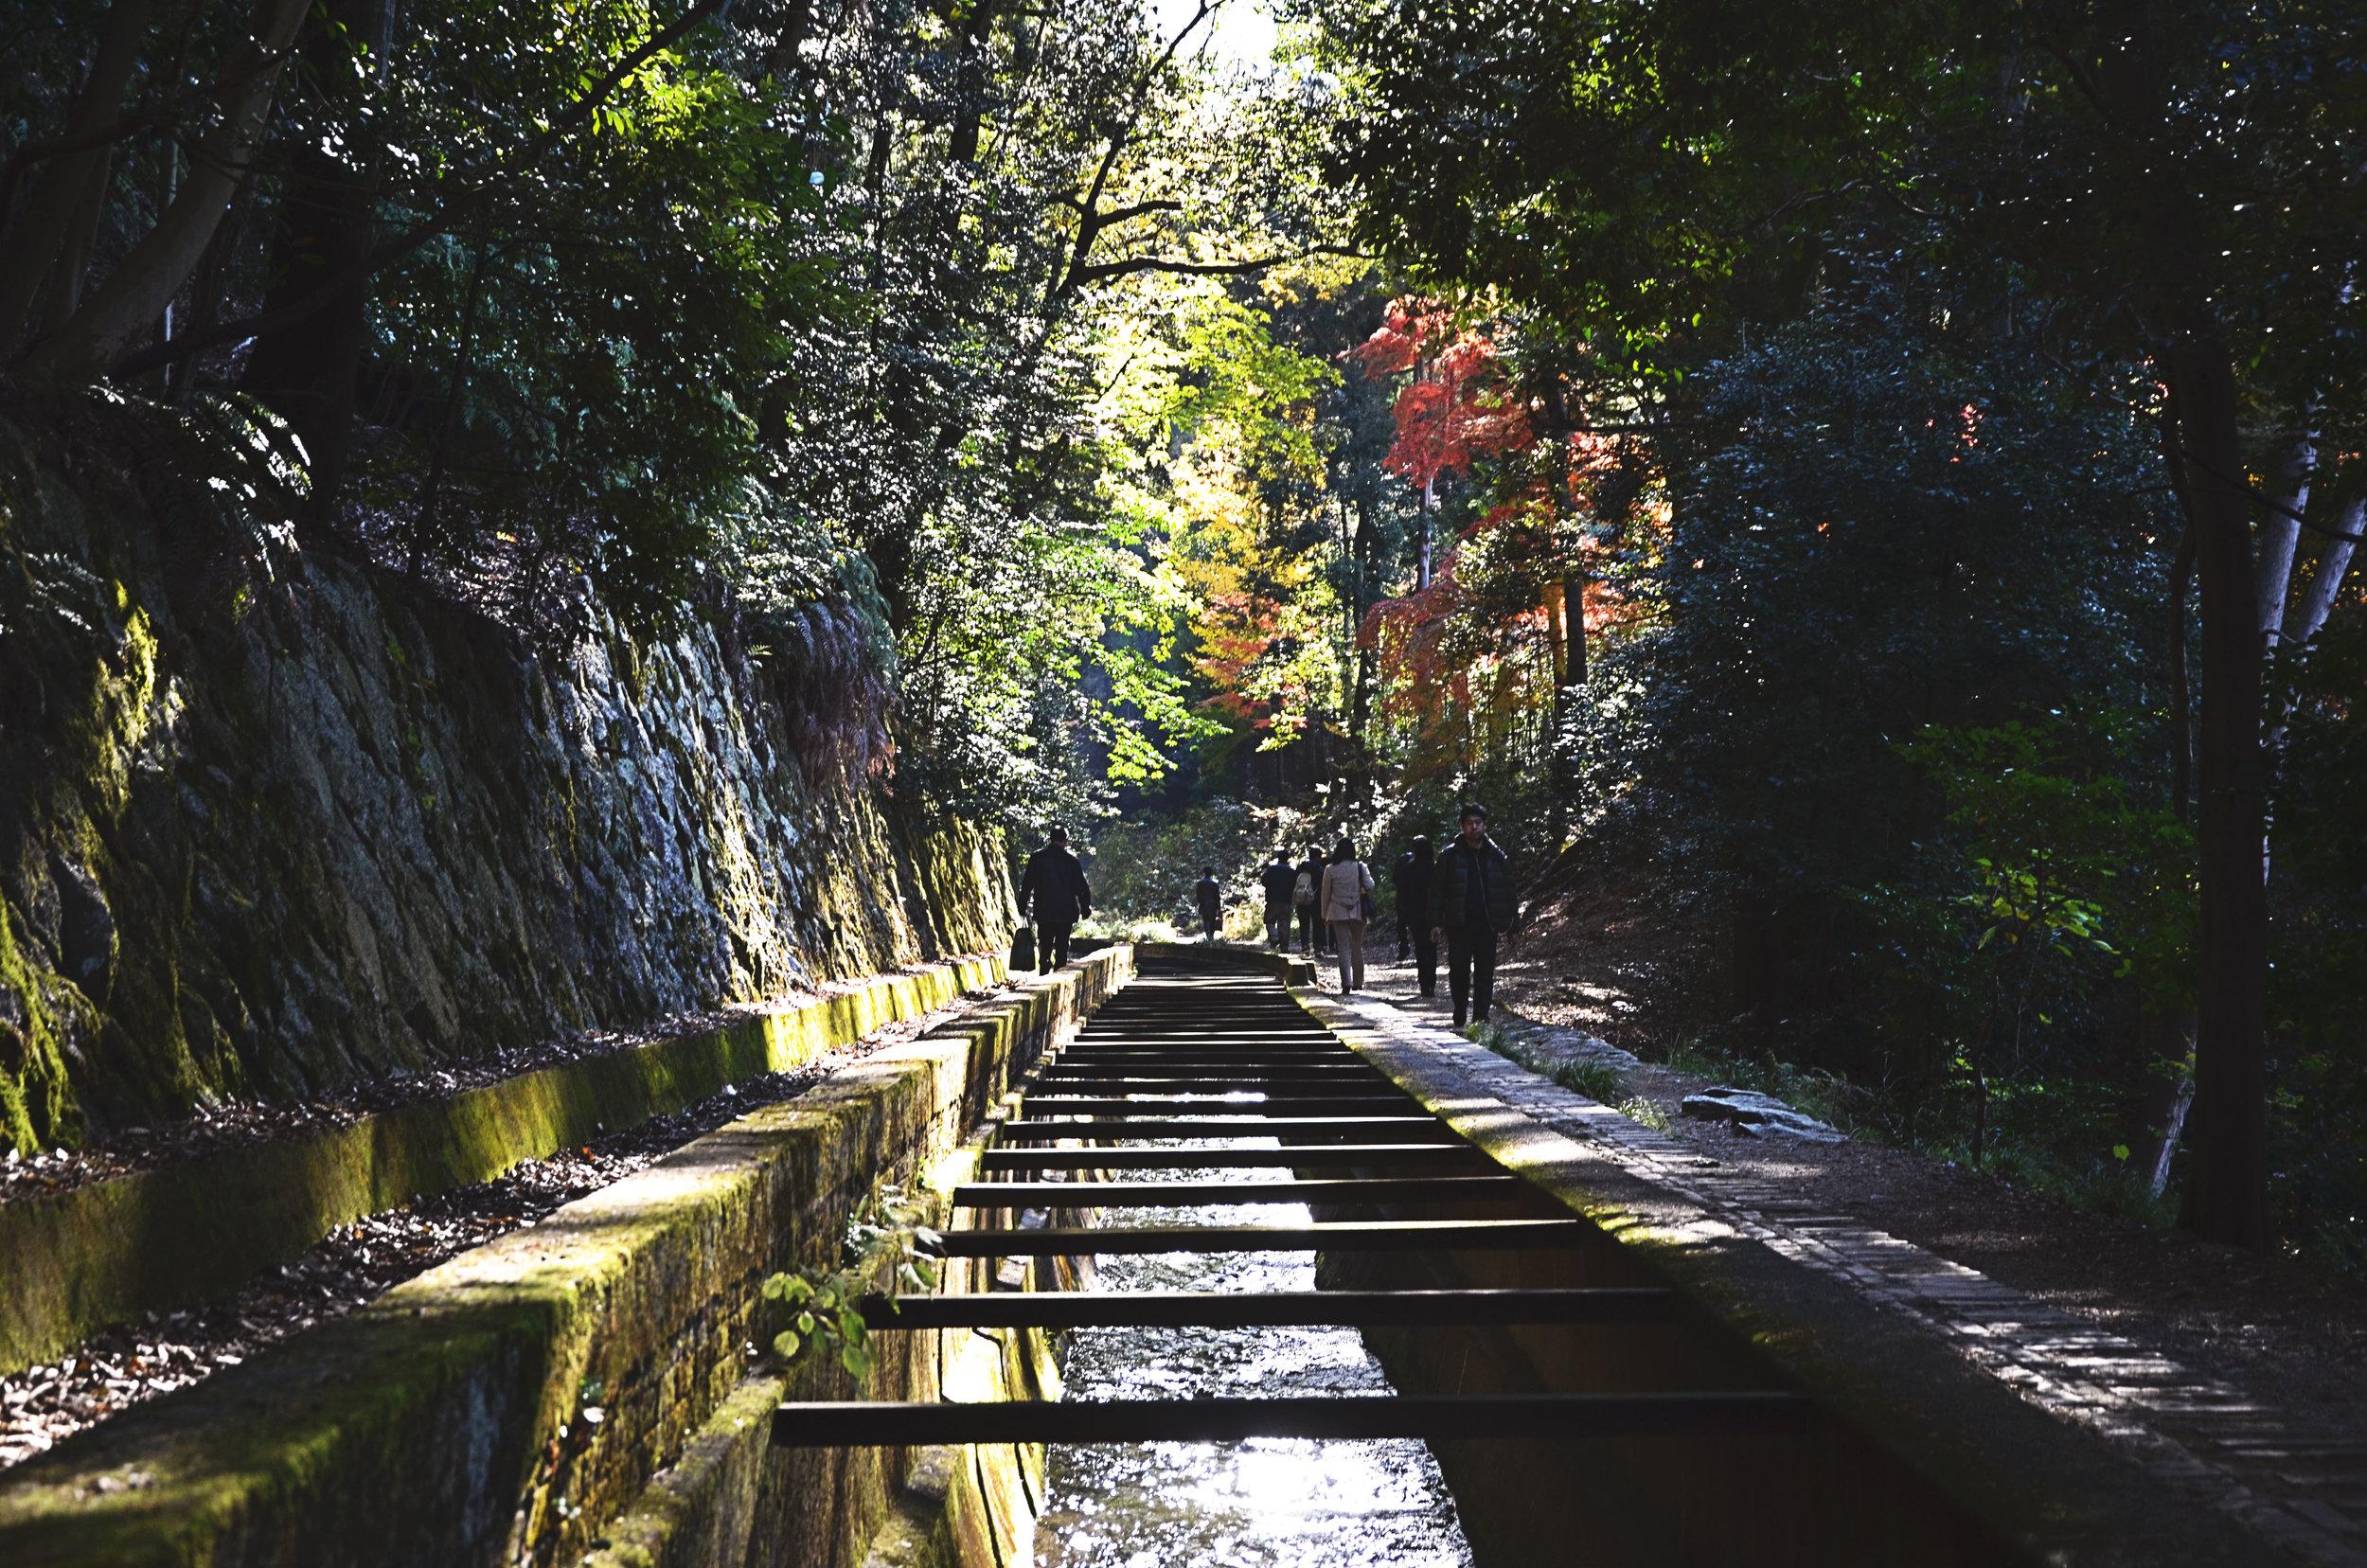 The aquaduct at Nanzen-ji temple in Kyoto